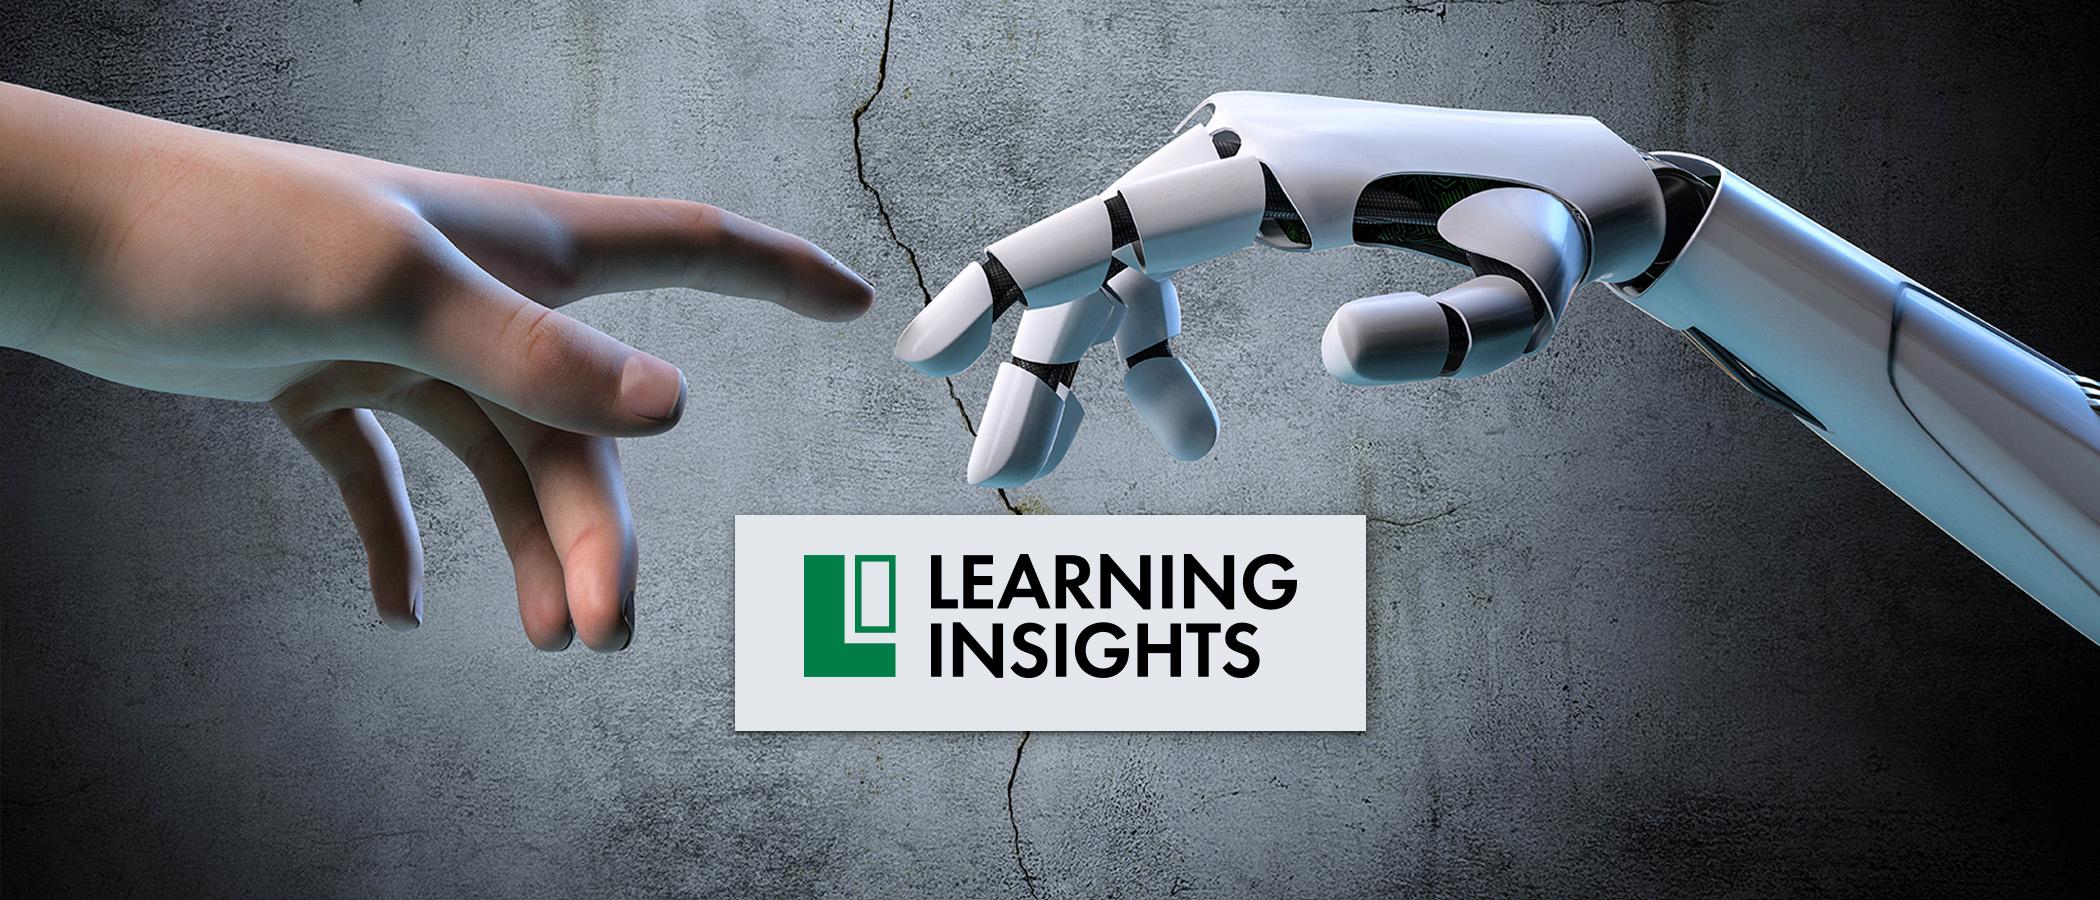 Learning Insights: Das Expertenportal startet durch